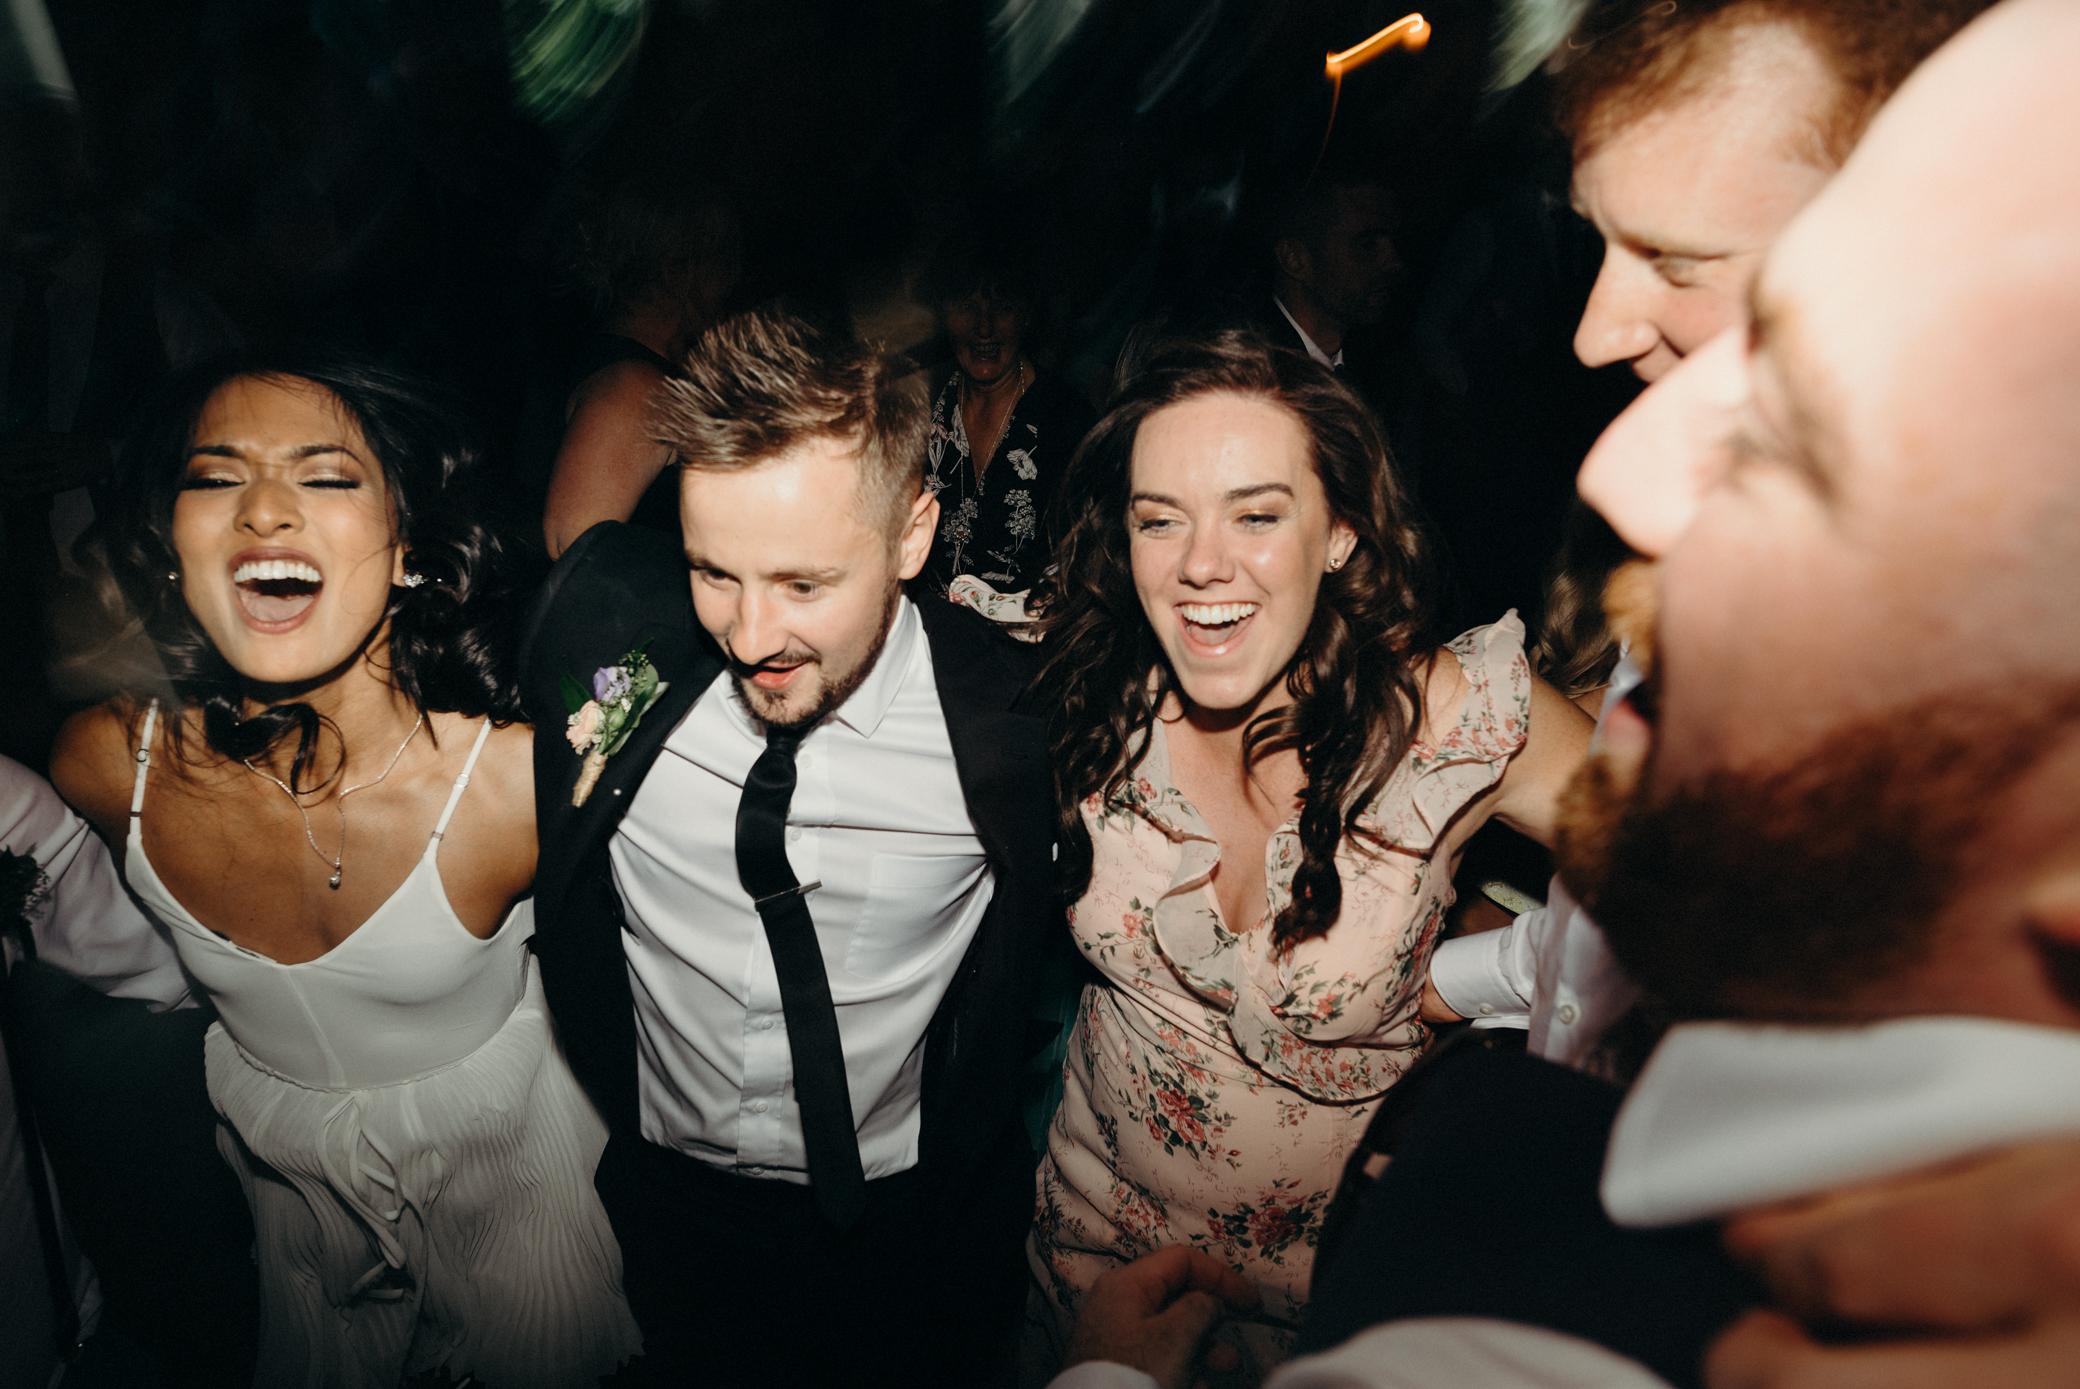 Alan&Naz- Barberstown Castle Wedding - Wedding photographer Ireland-222.jpg